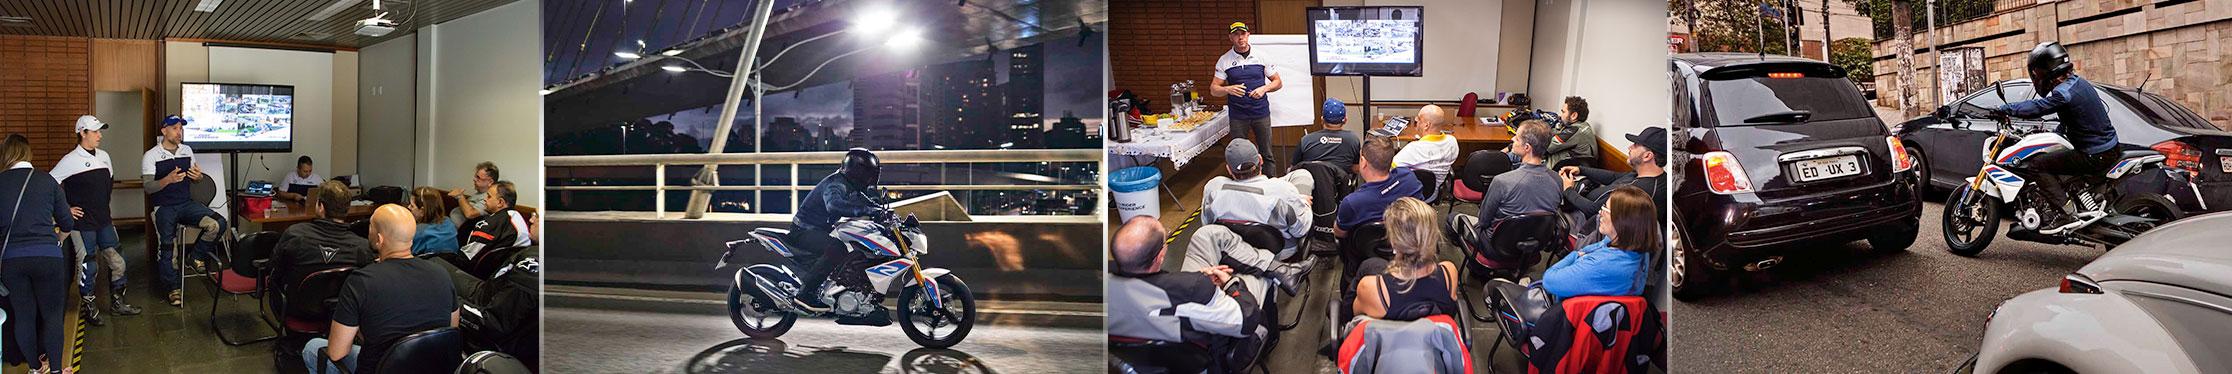 BMW-Rider-Experience_Palestra-Tecnicas-Centros-Urbanos